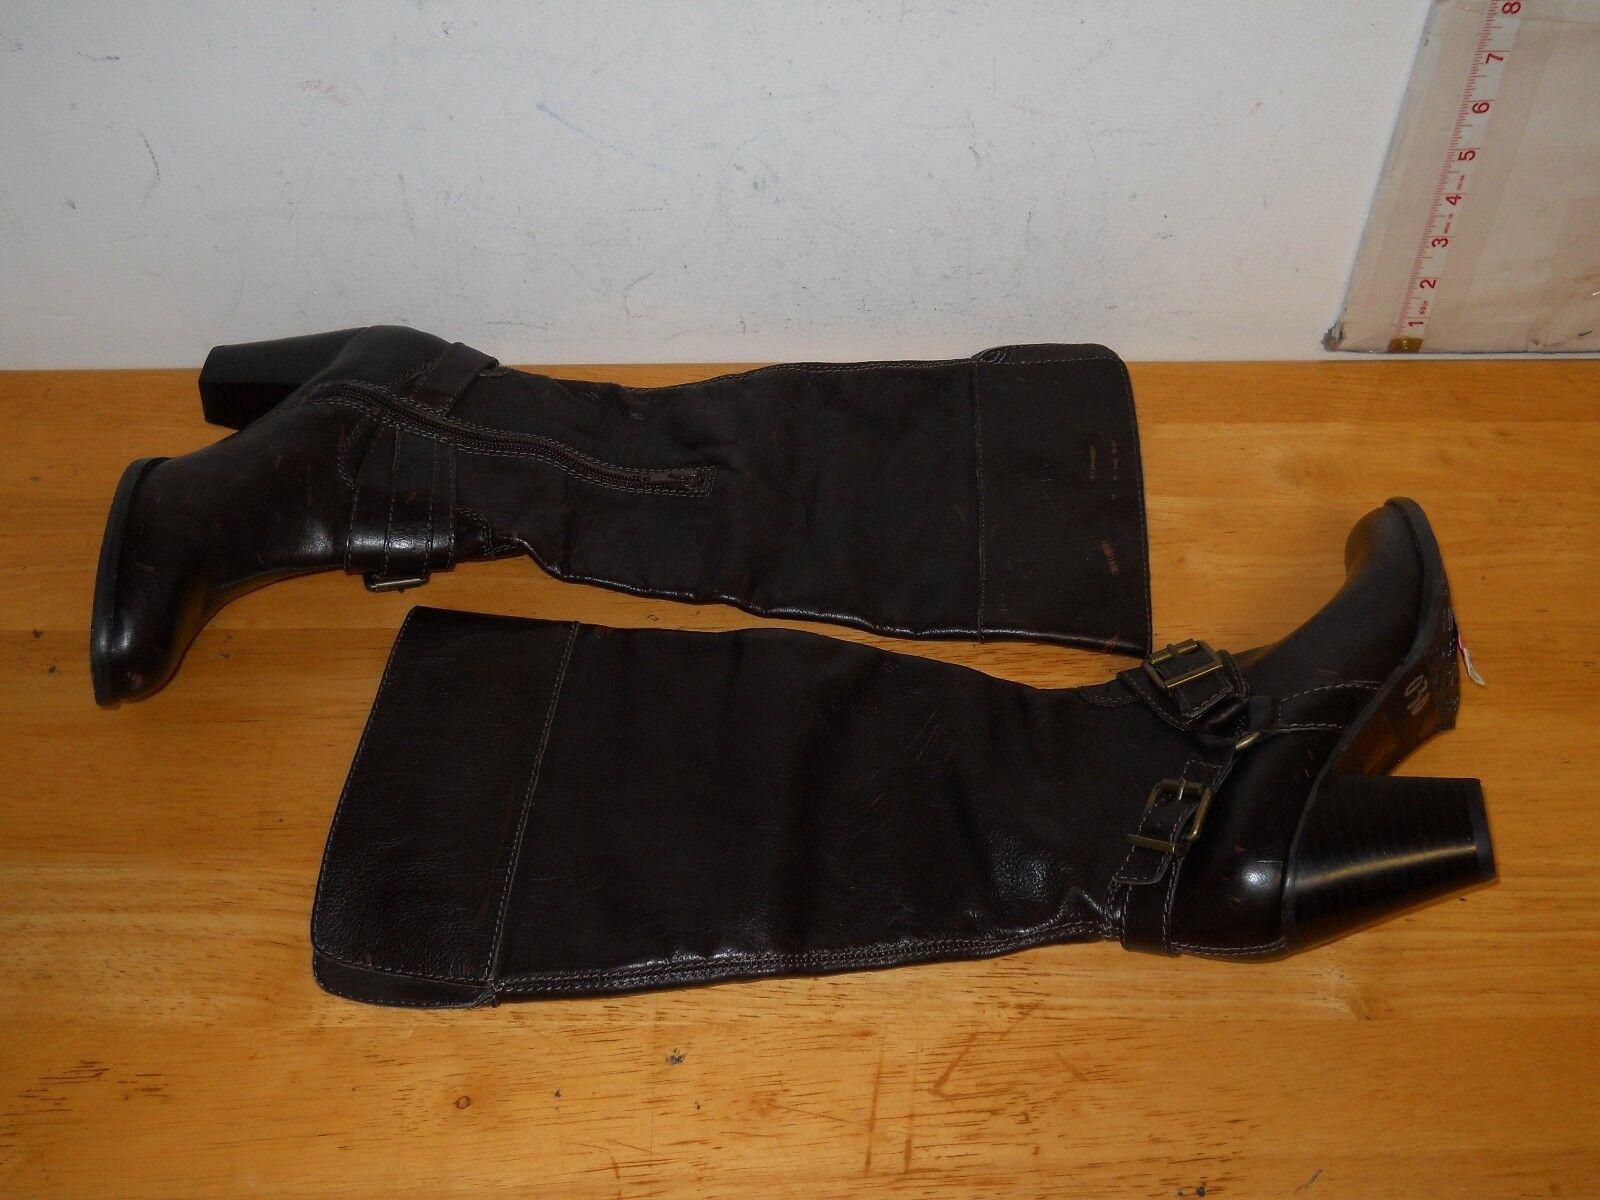 Arturo Chiang New Damenschuhe AT Vala Distressed Dark Braun Stiefel 6.5 M Schuhes NWOB